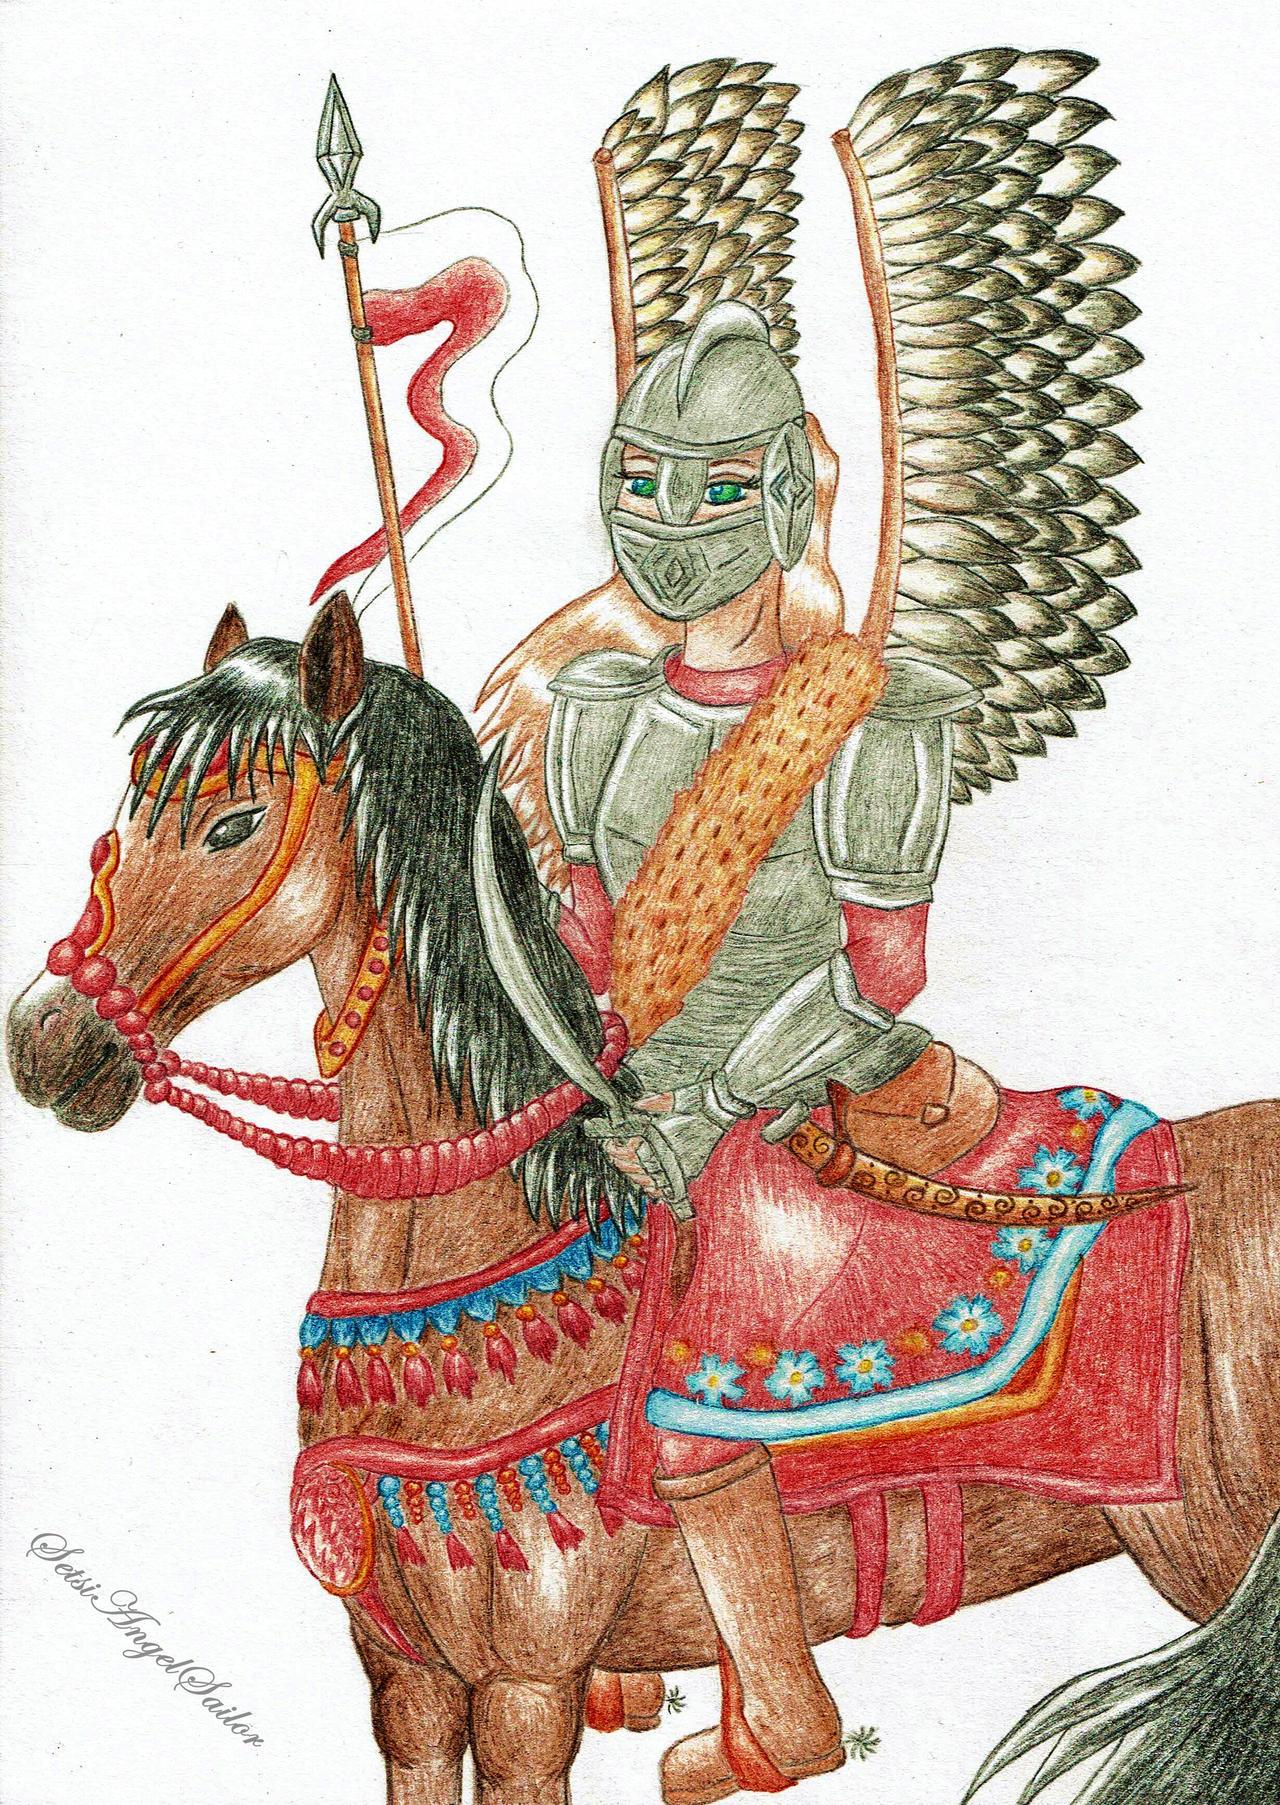 Polish hussar's girl by Angie-AgnieszkaB